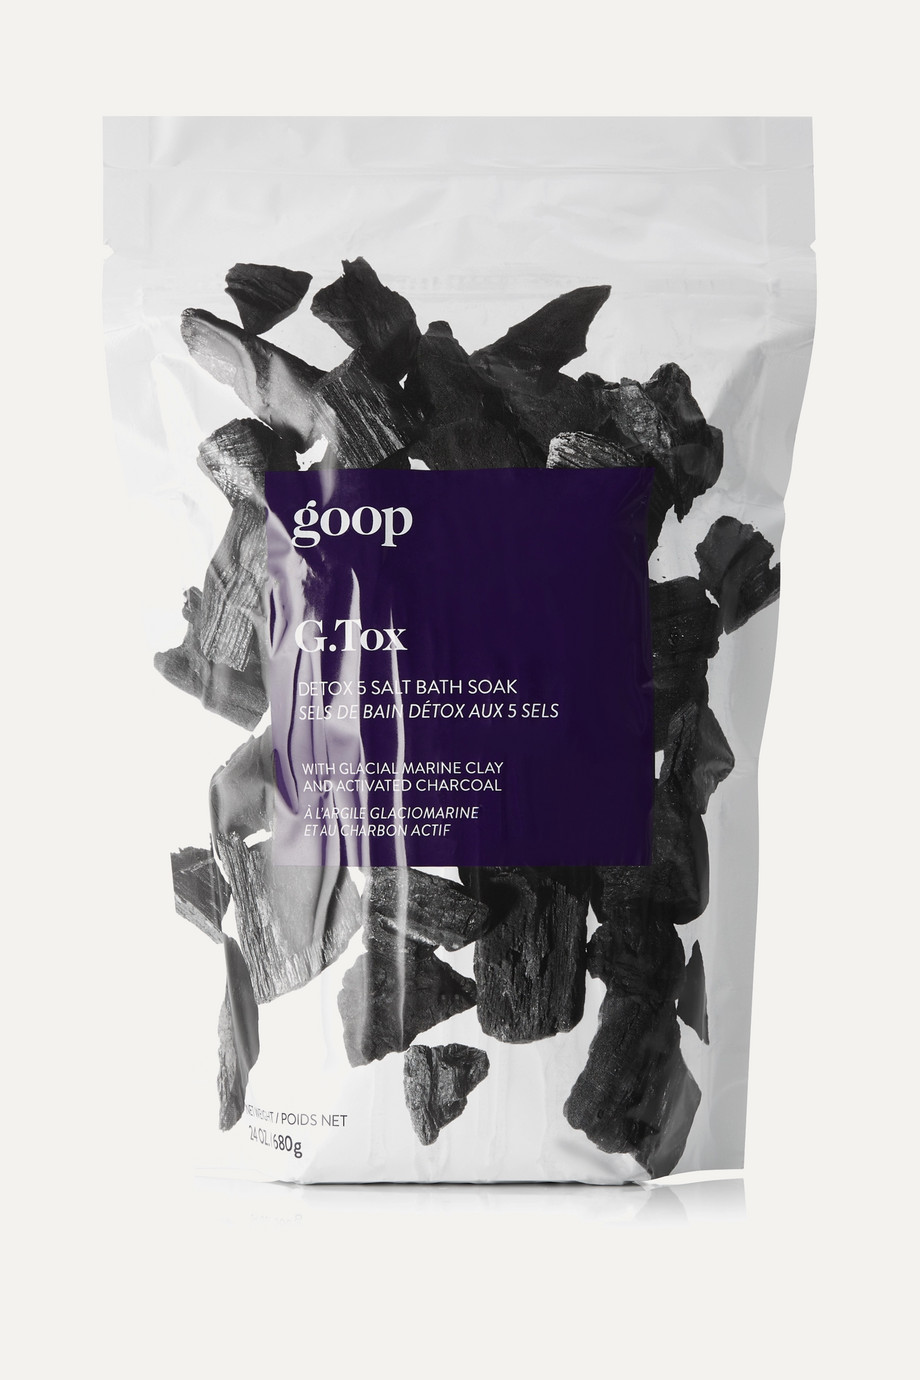 goop G.Tox Bath Soak, 680g